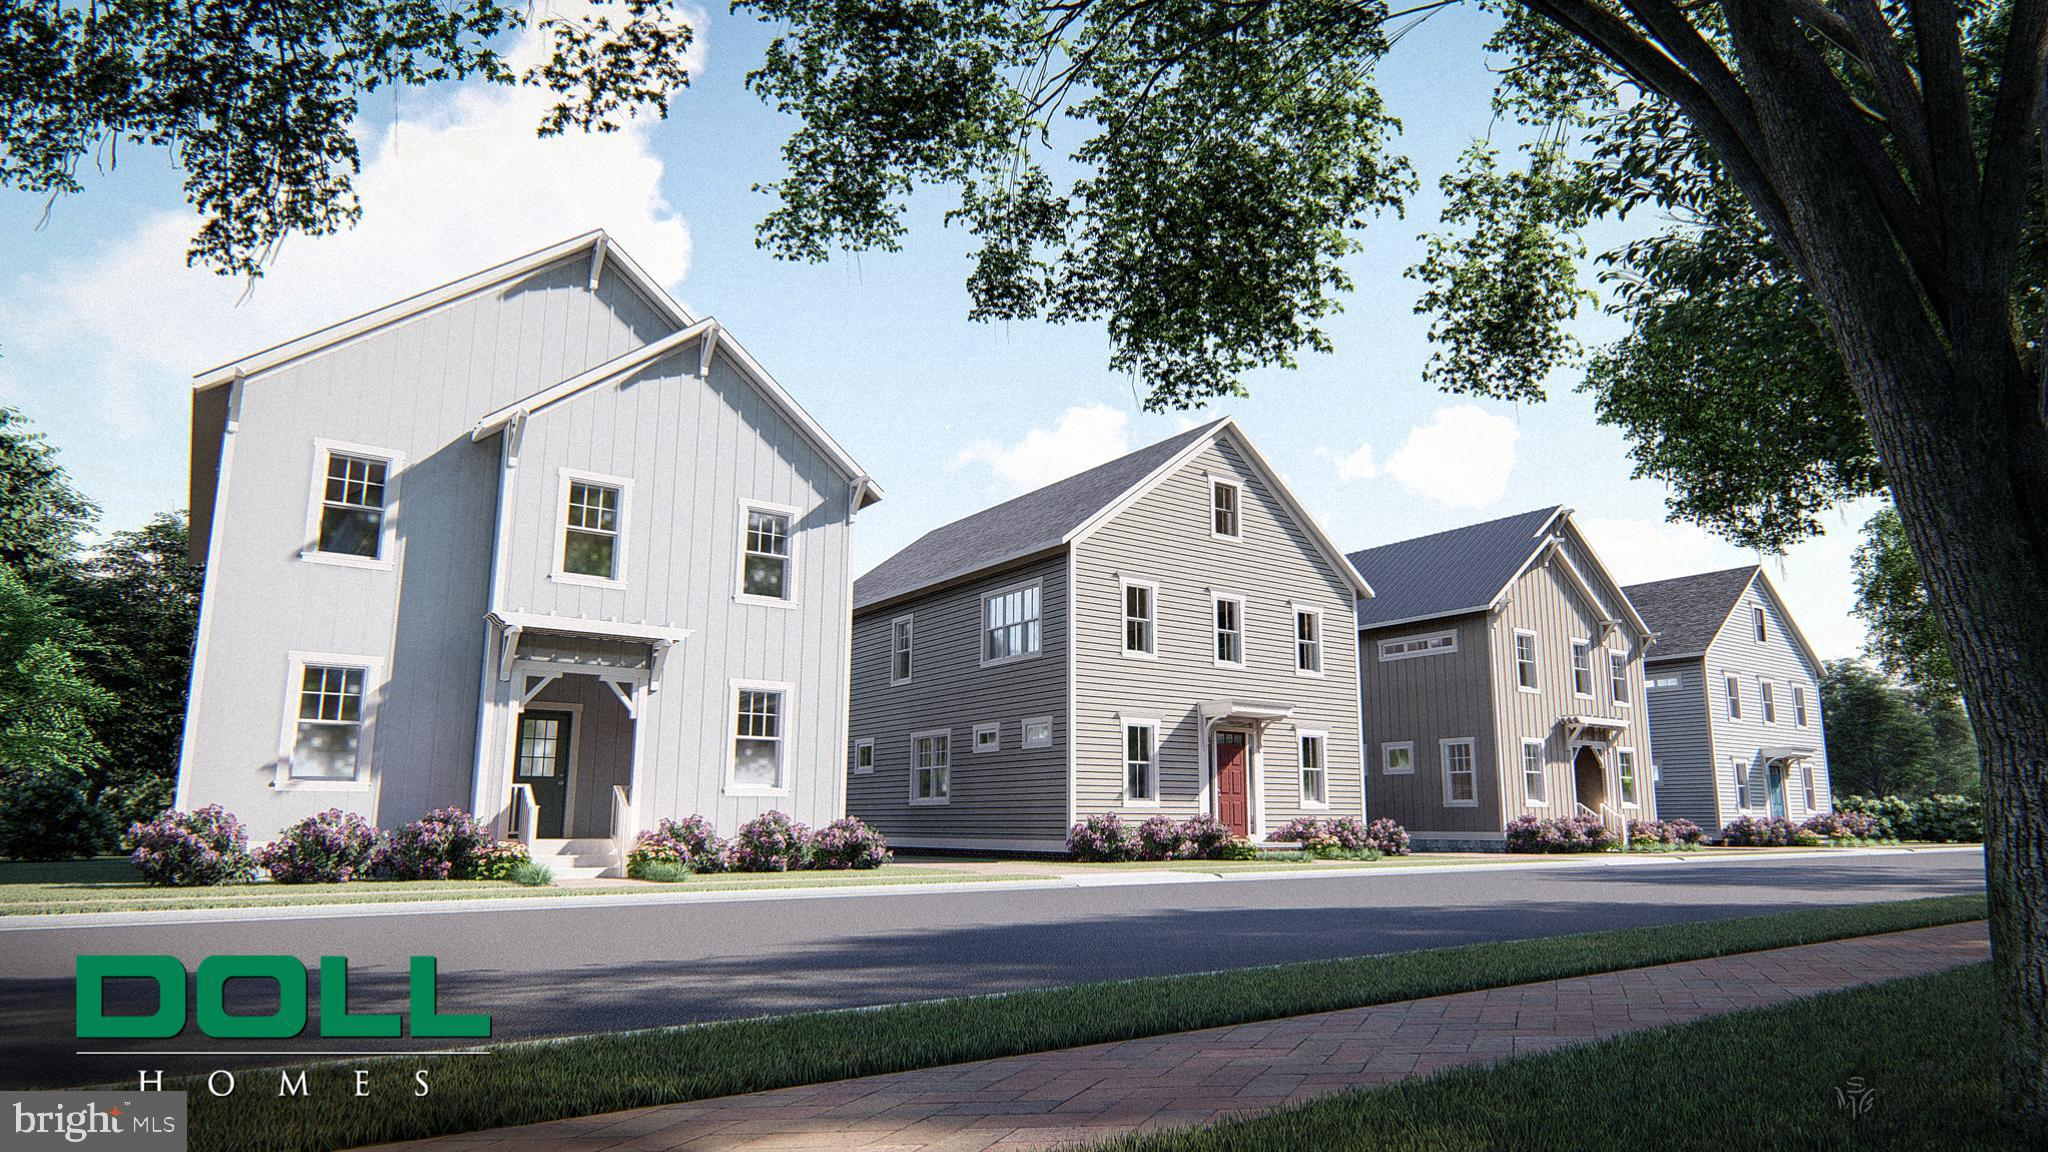 637 JEFFERSON ST, HERNDON, VA 20170